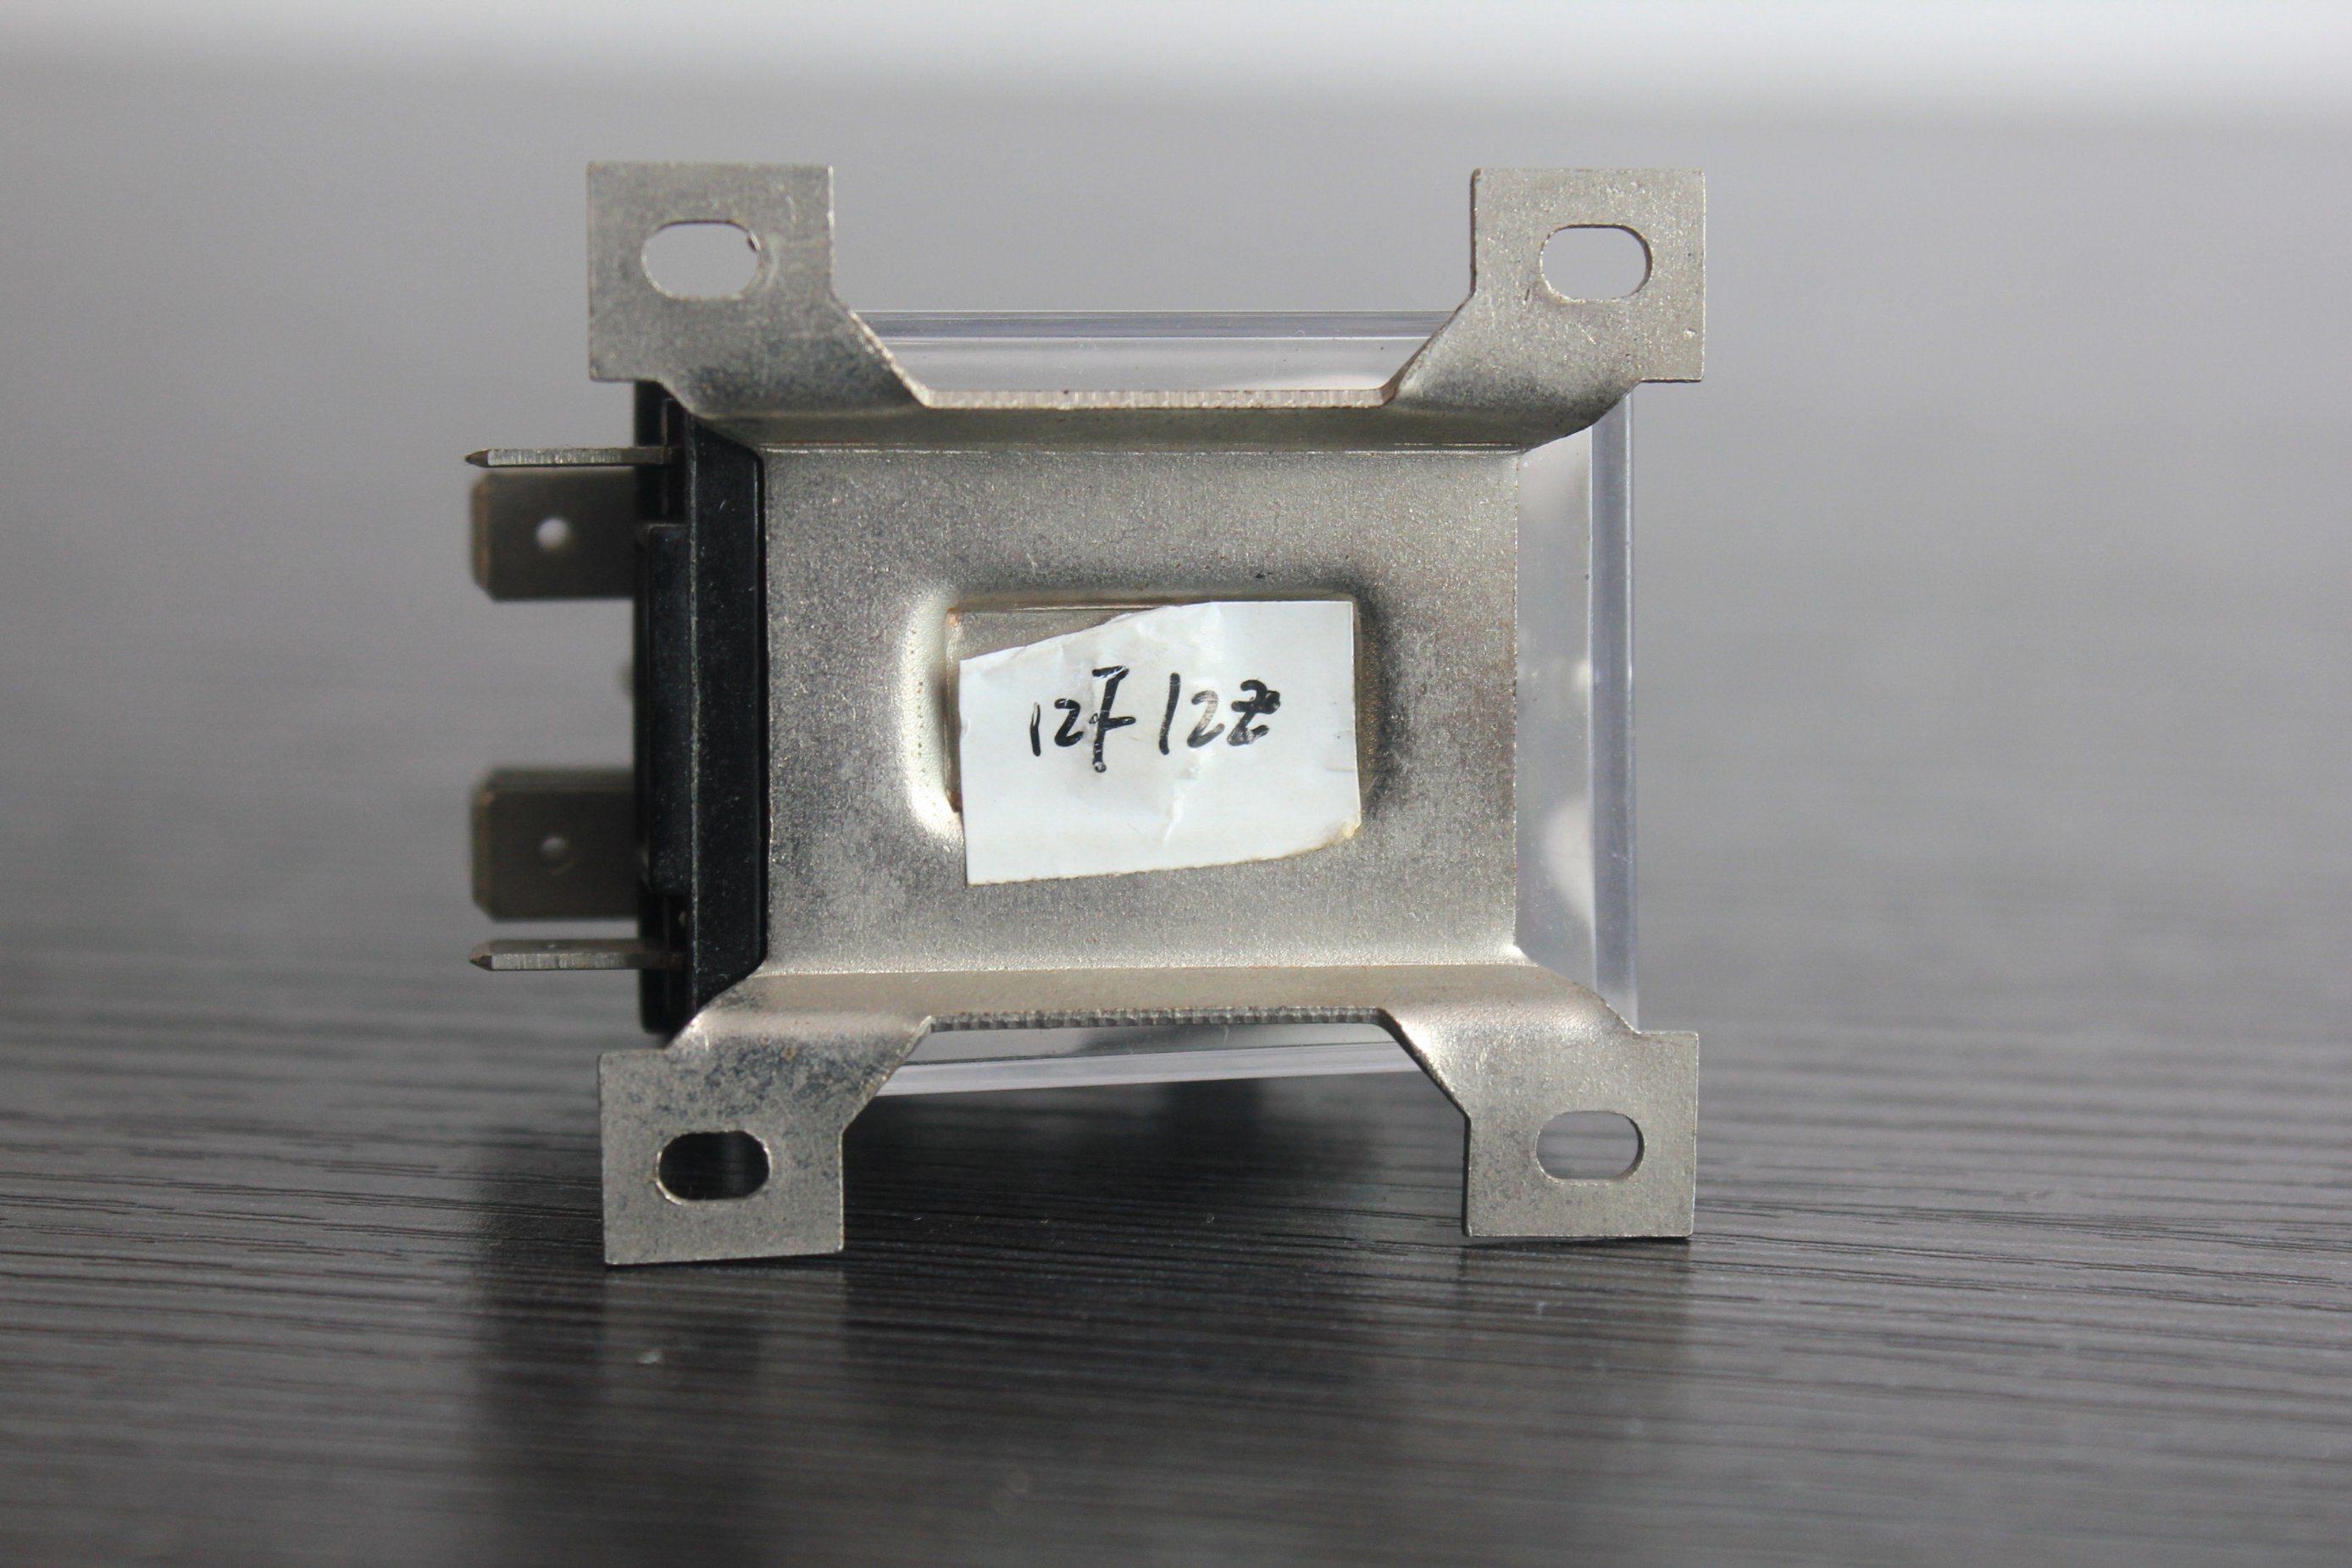 Dpdt Relay 12v 30a 12 Volt 8 Kaki China Jqx12f 2z Dc Pin General Purpose Big Power